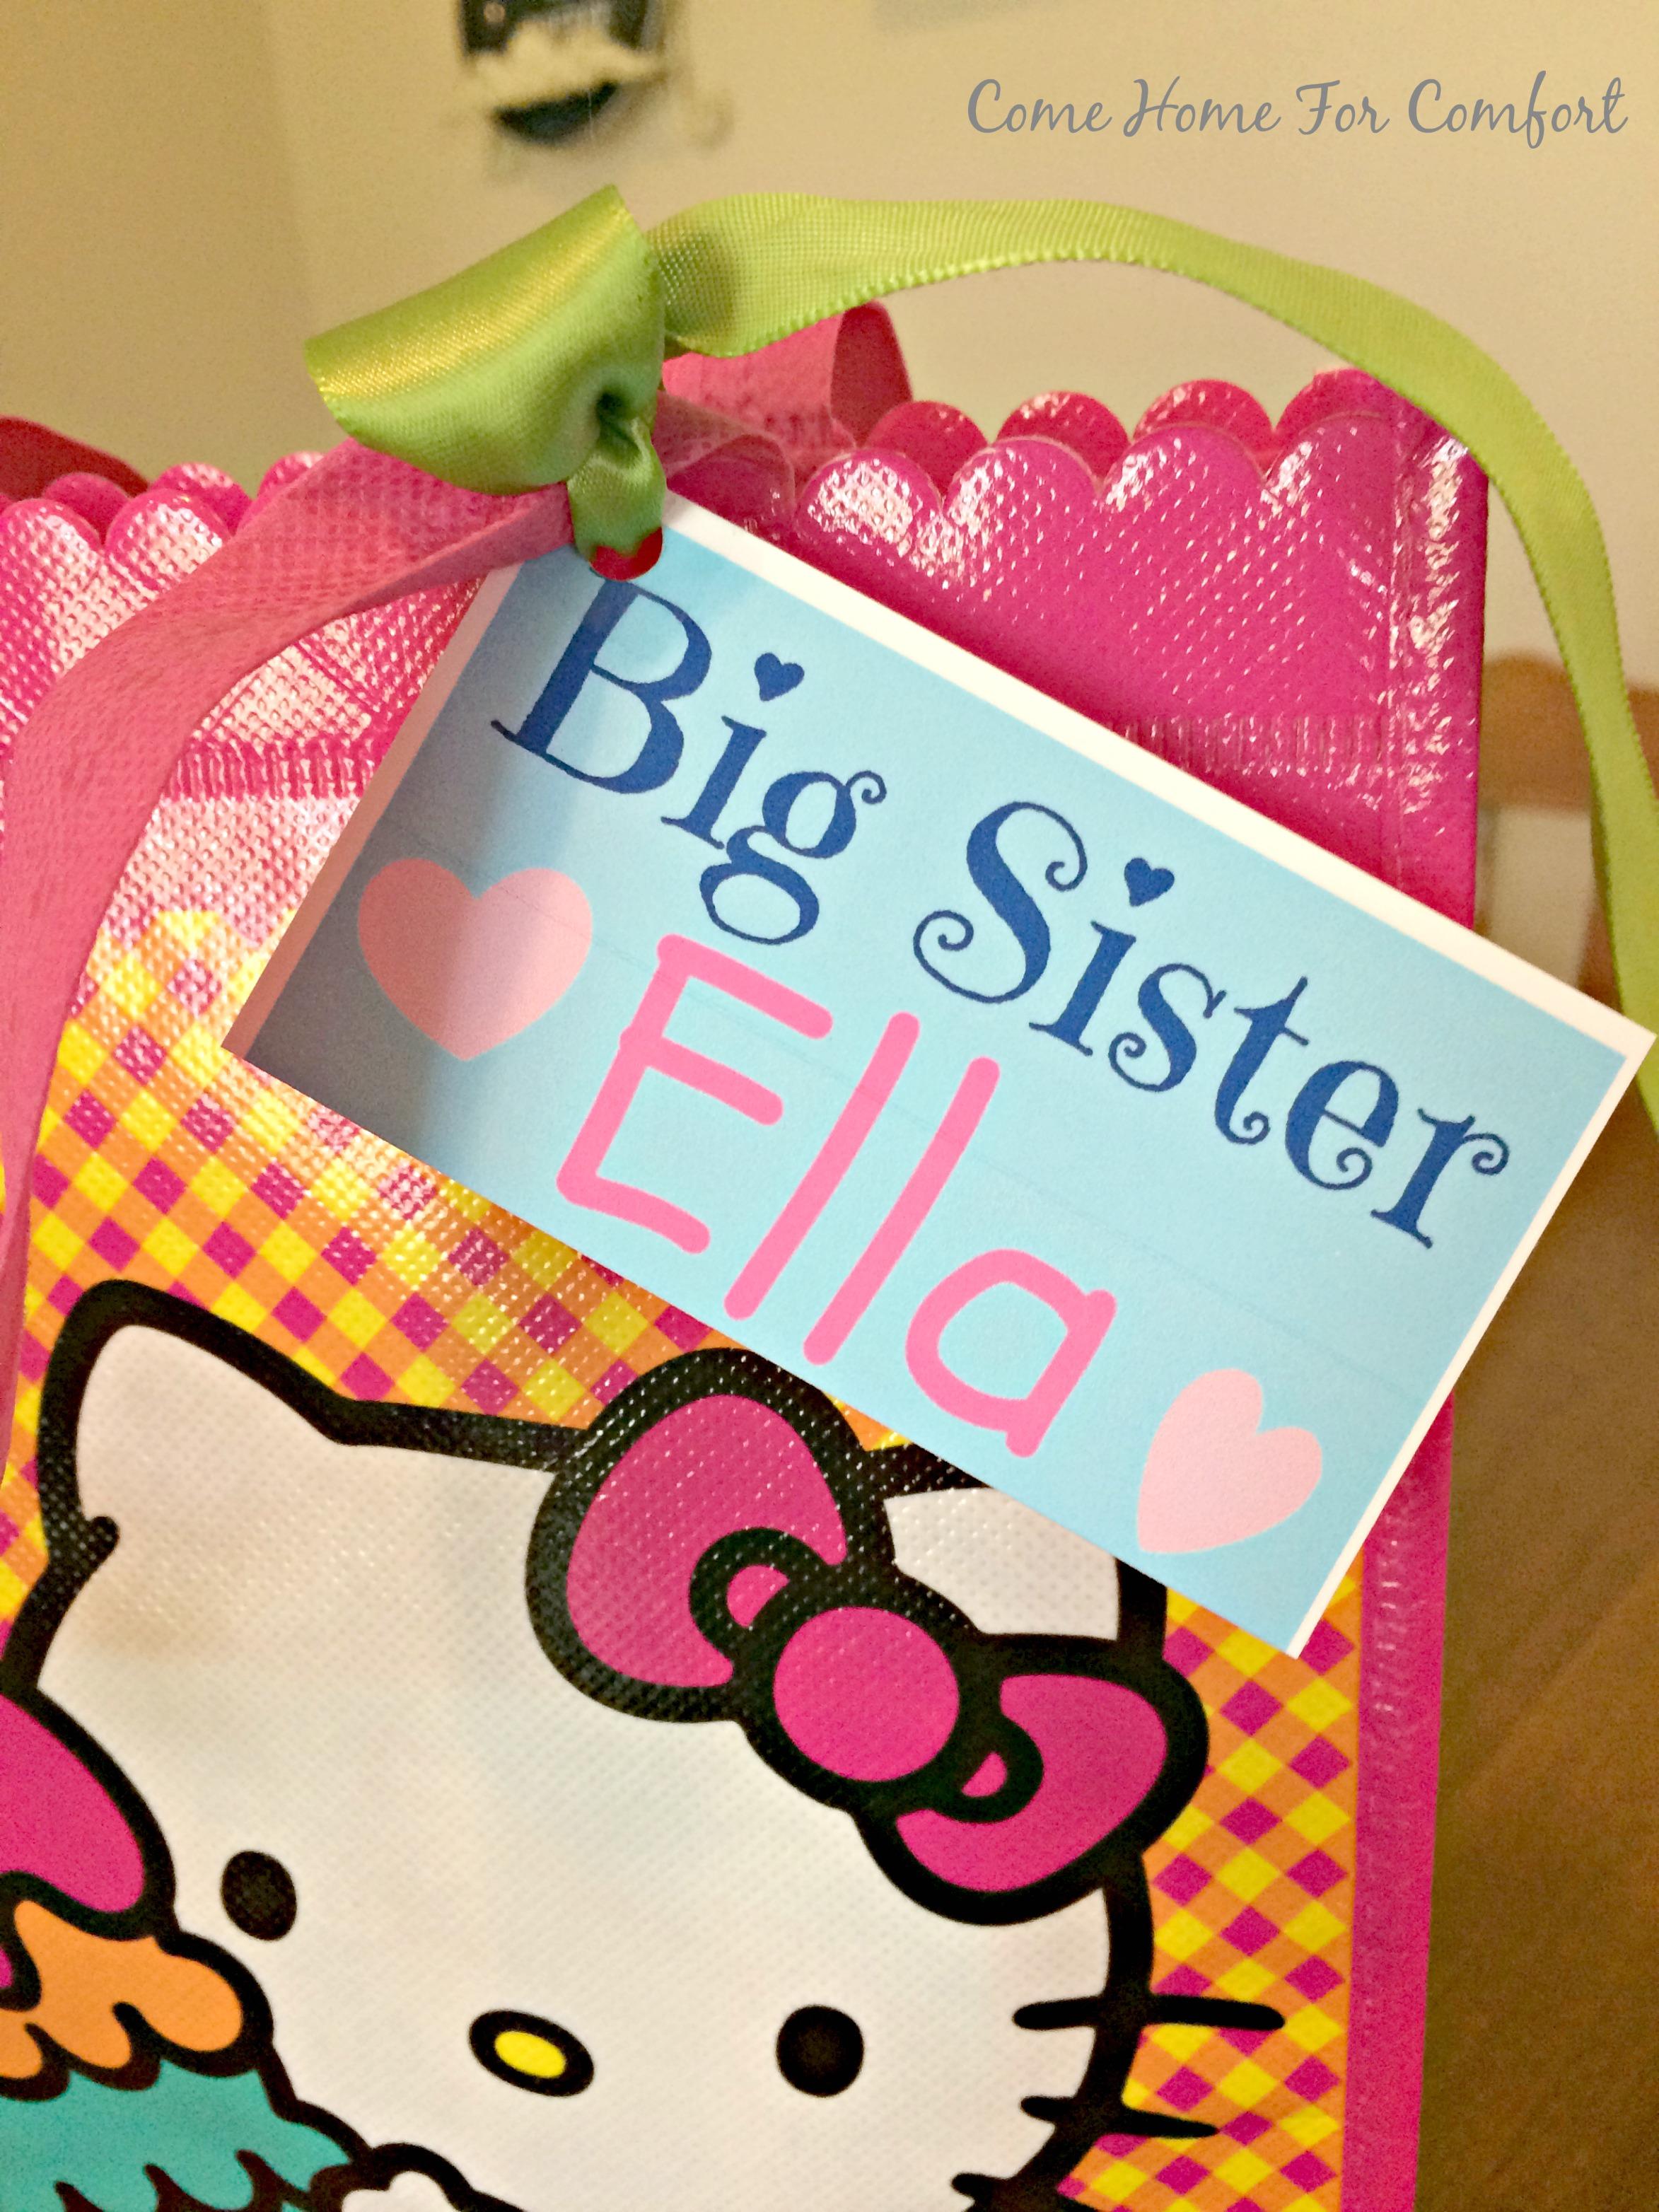 Big Sister survival kit via Come Home For Comfort